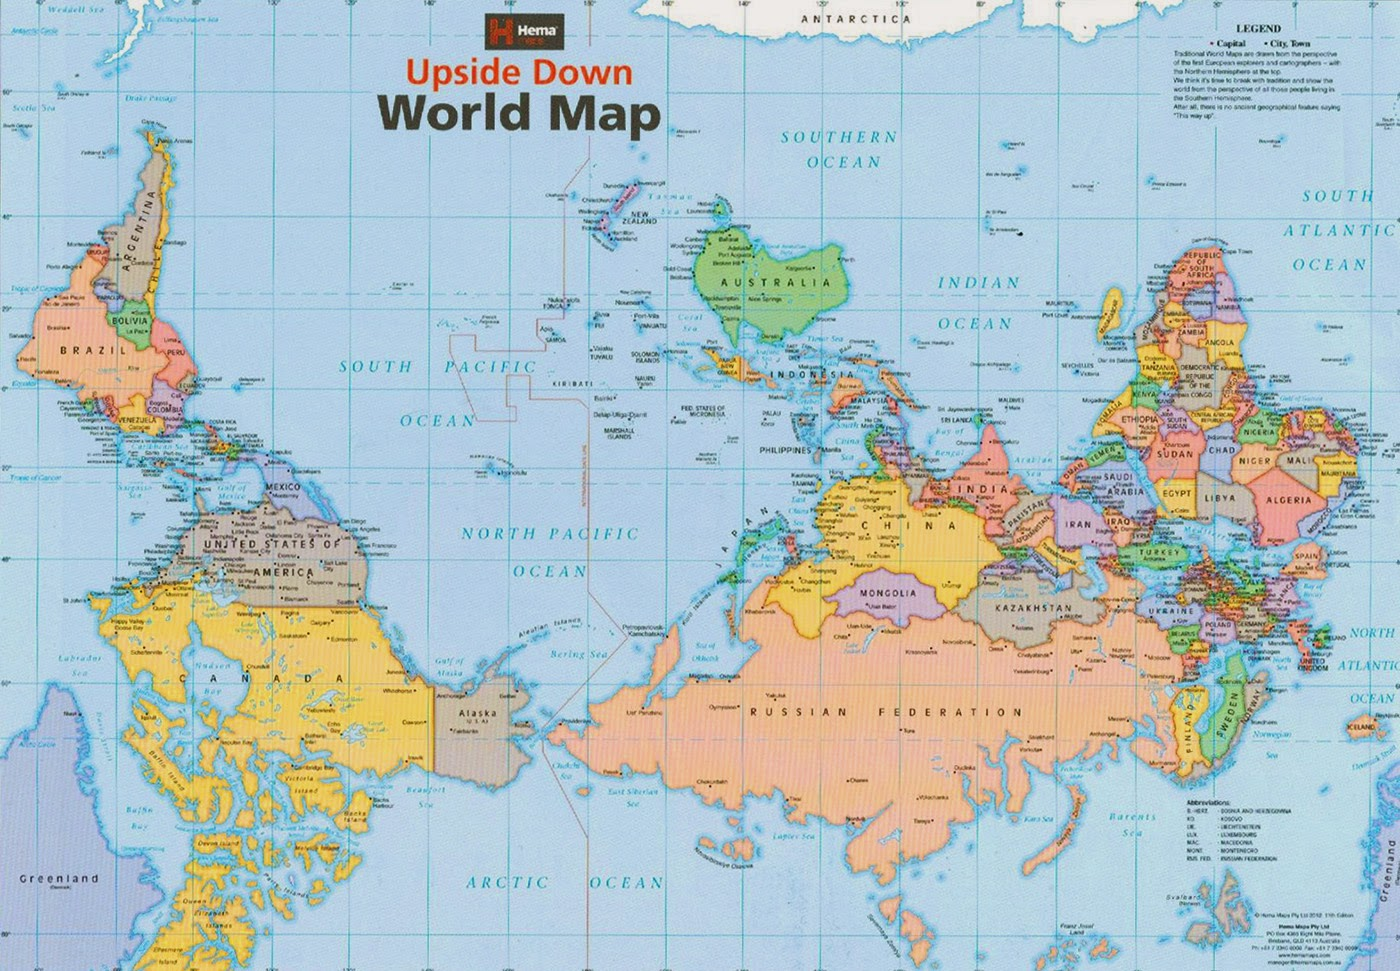 карта мира взгляд из Австралии